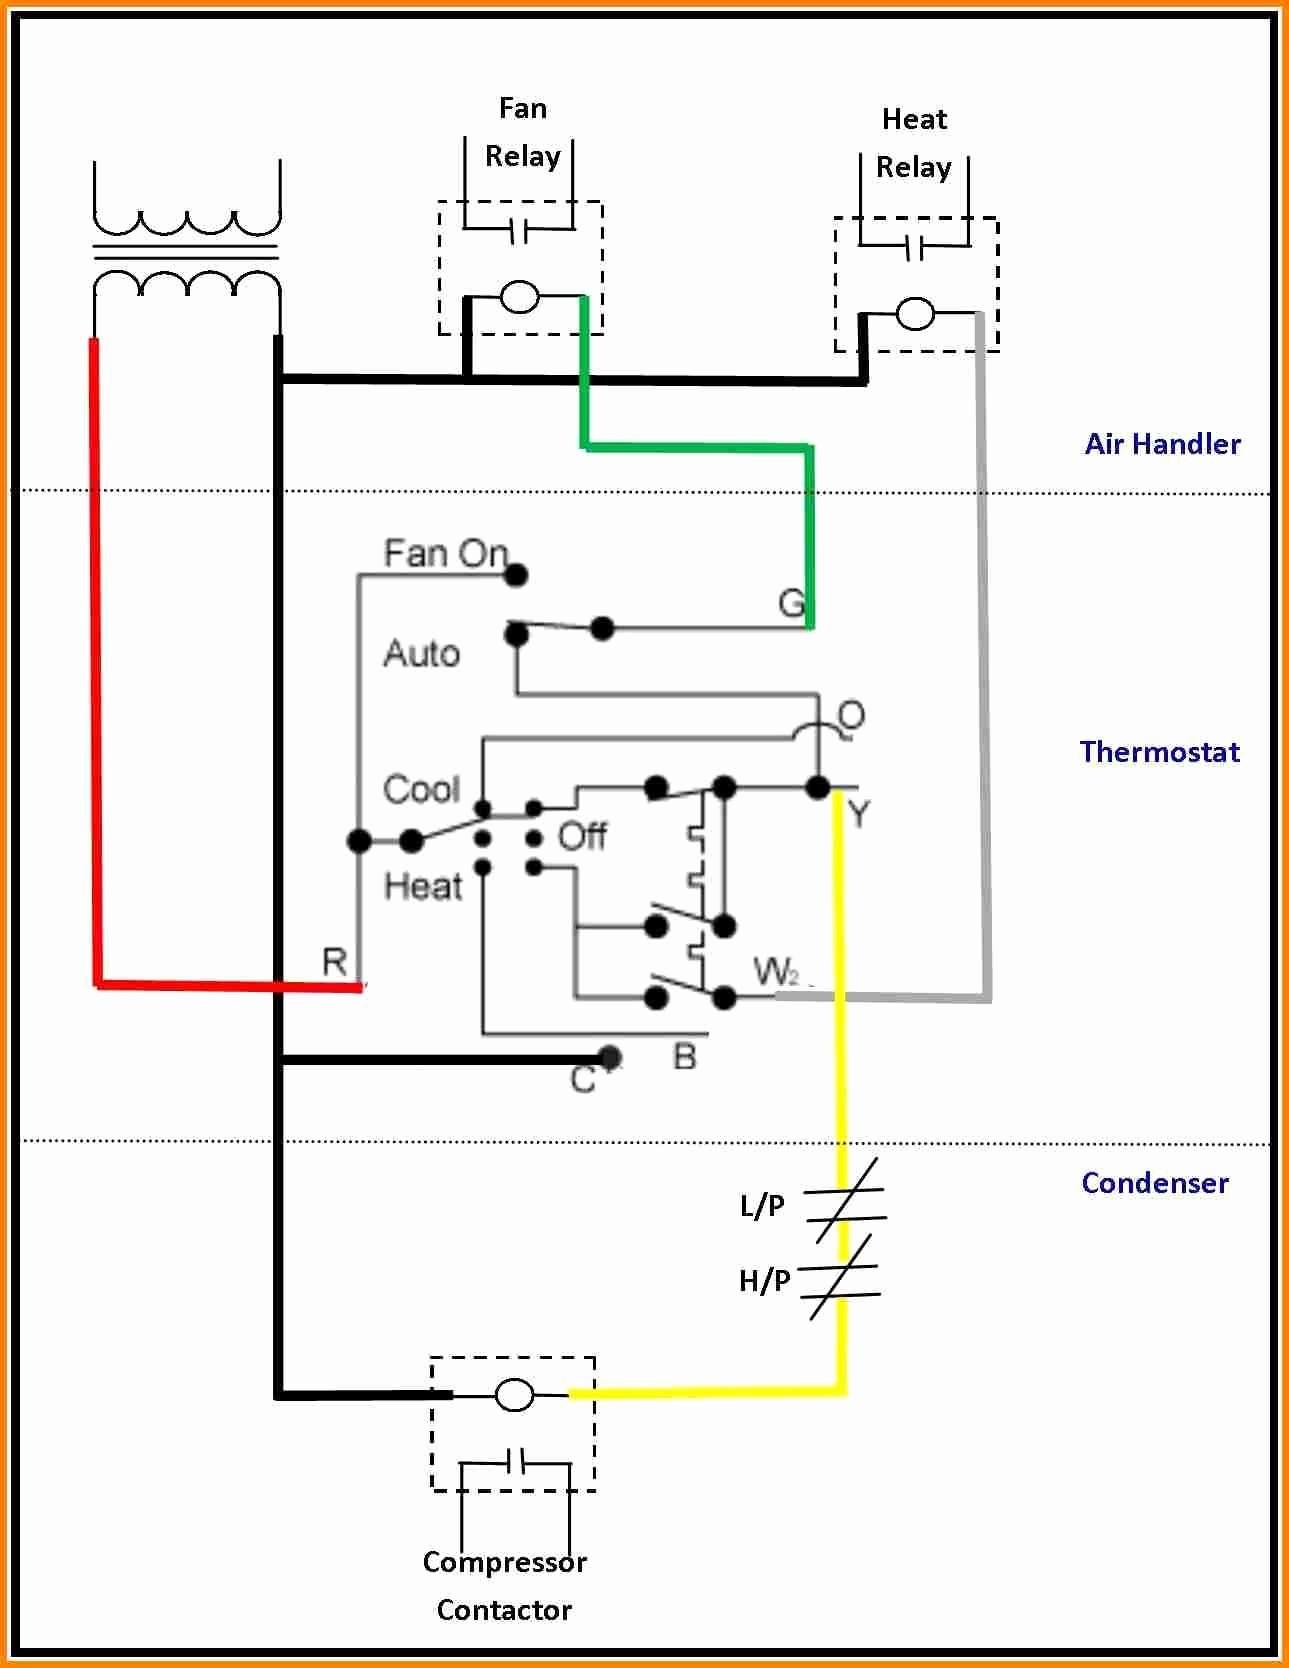 Full Size of Wiring Diagram Fan Relay Wiring Diagram New Ac Hvac Wiring Free Download